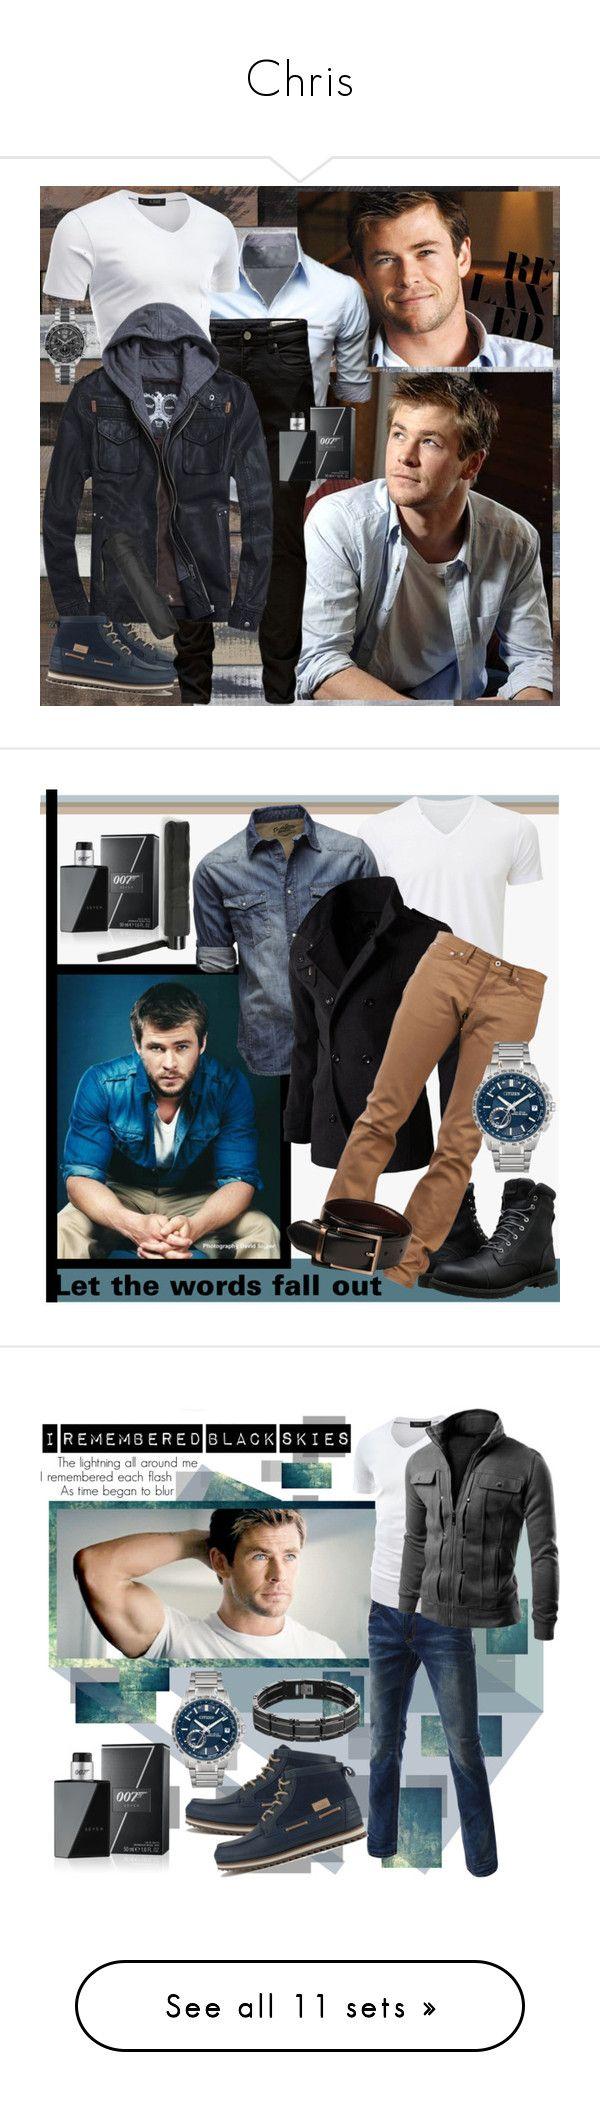 """Chris"" by julyralewis ❤ liked on Polyvore featuring Lacoste, Jack & Jones, Doublju, TAG Heuer, MANGO, James Bond 007, men's fashion, menswear, Timberland and Uniqlo"